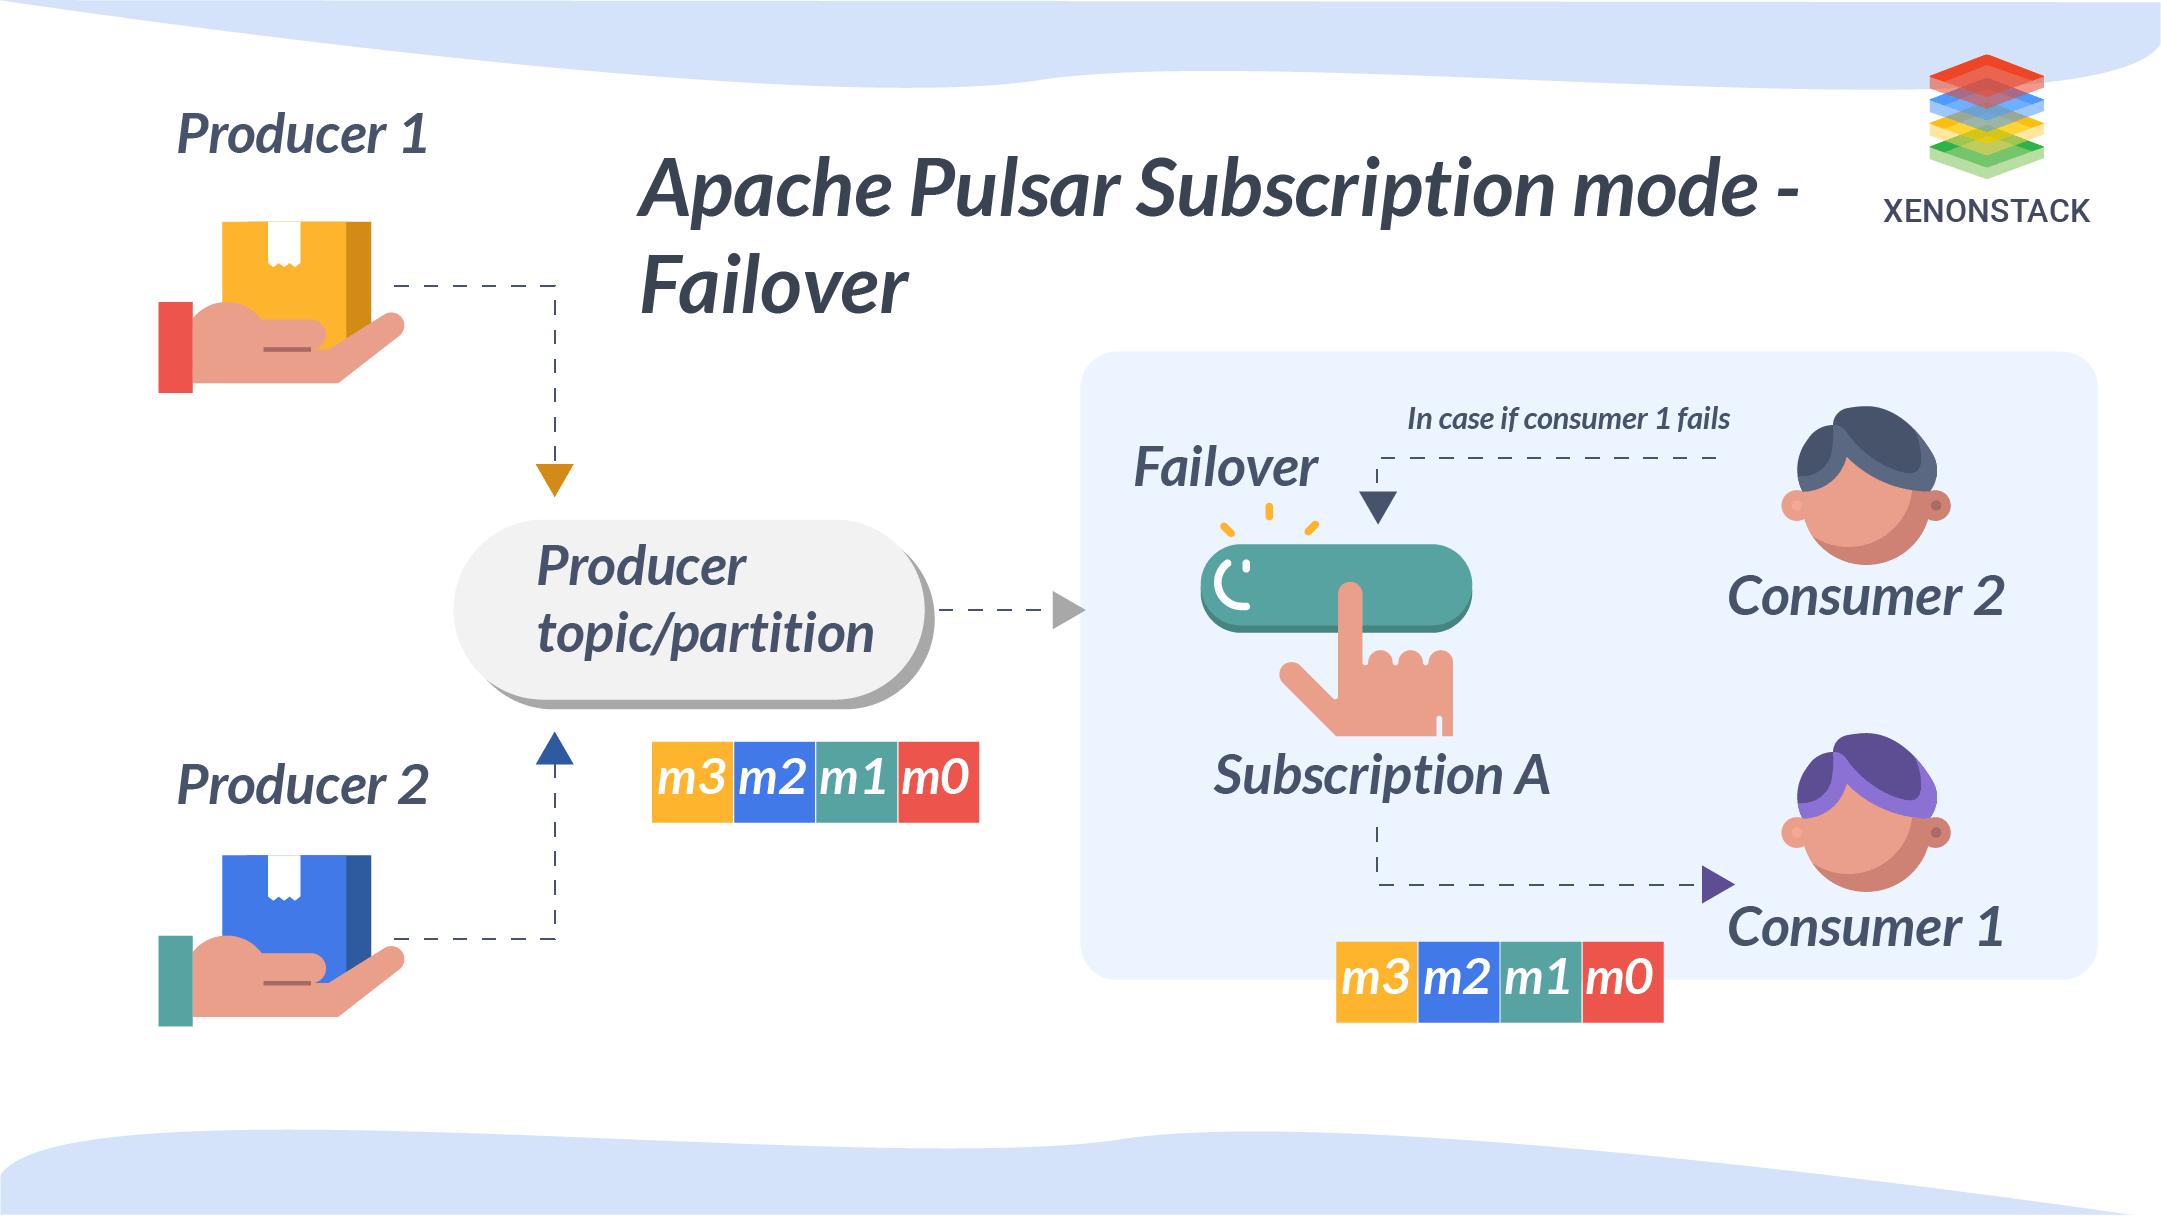 Apache Pulsar Subscription Failover